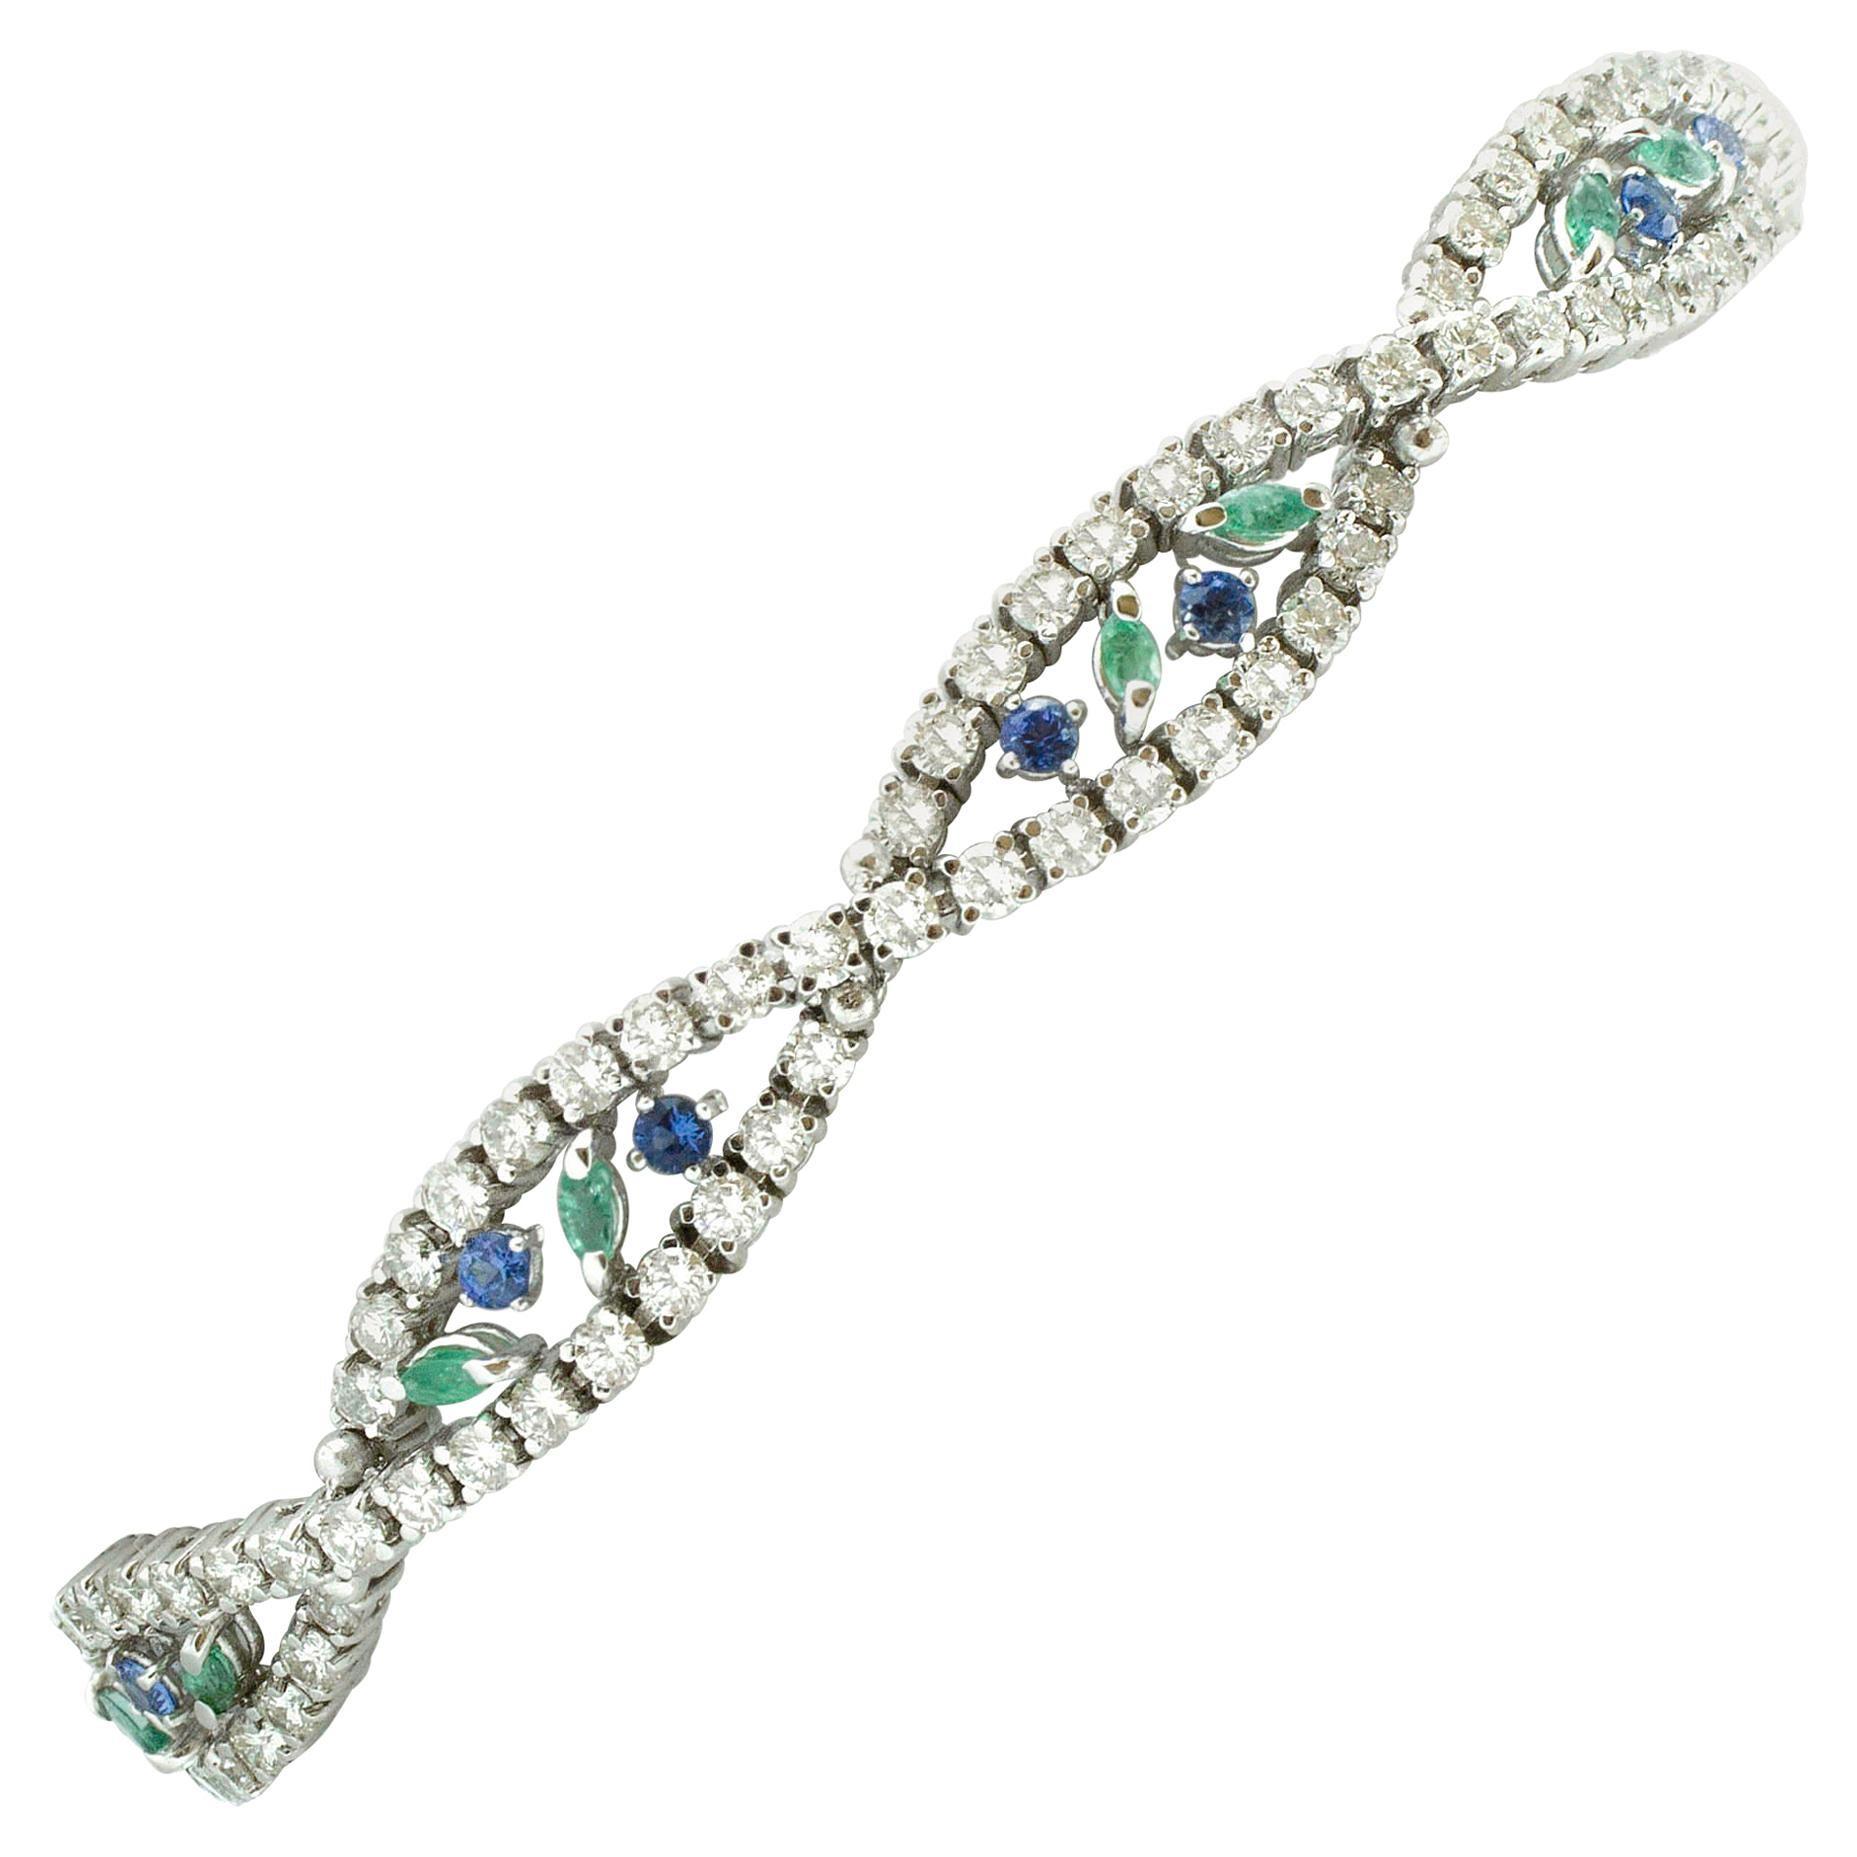 Diamonds, Emeralds, Blue Sapphires, 18 Karat White Gold Bracelet